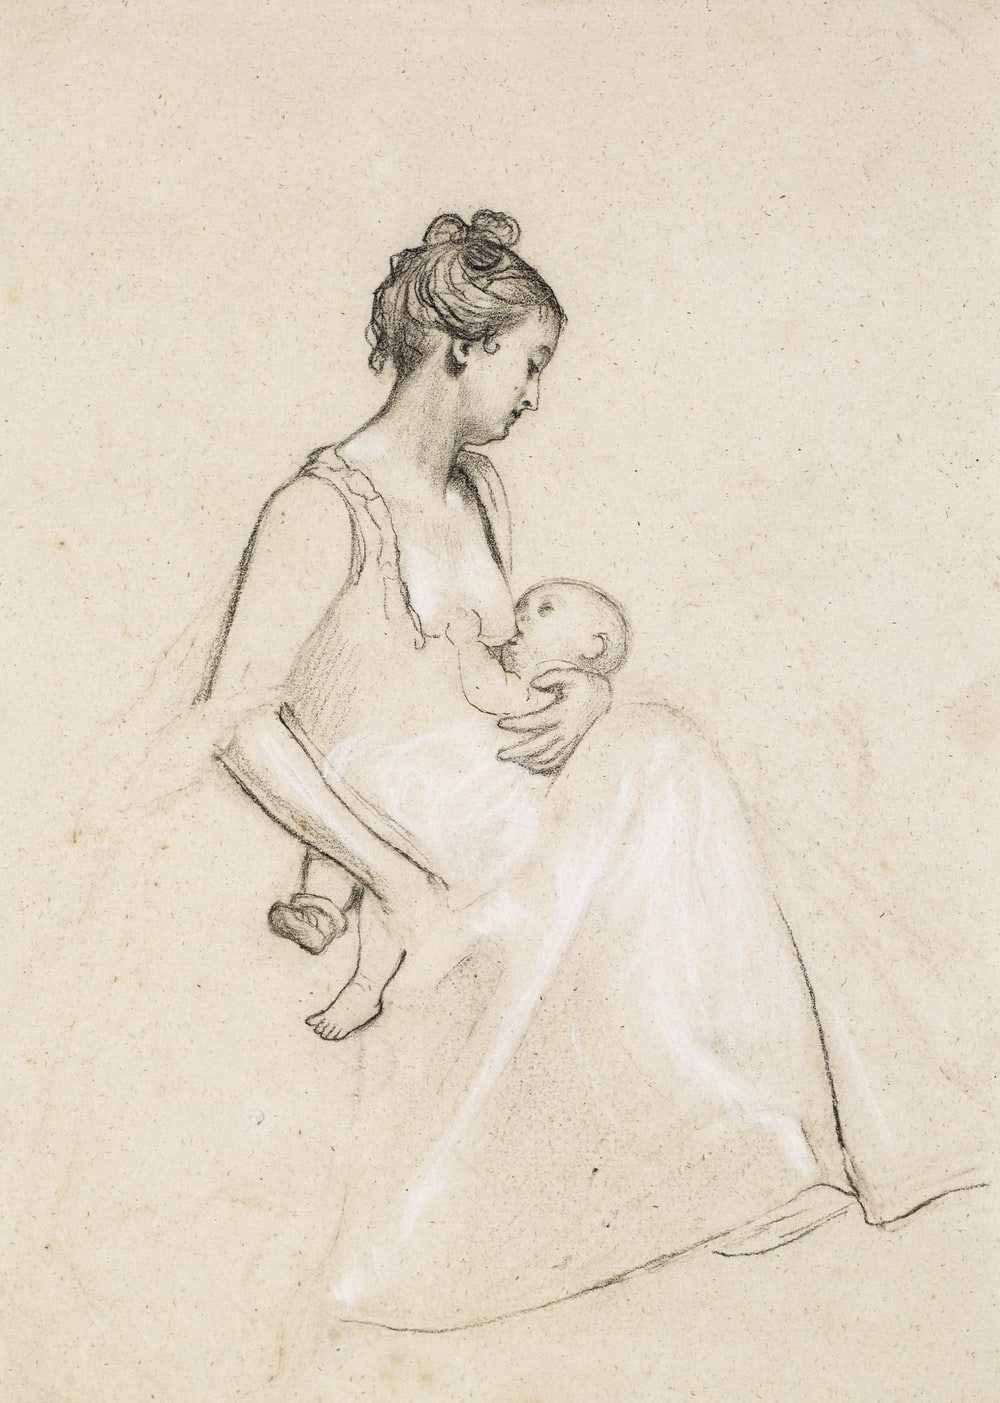 woman in white dress sketch